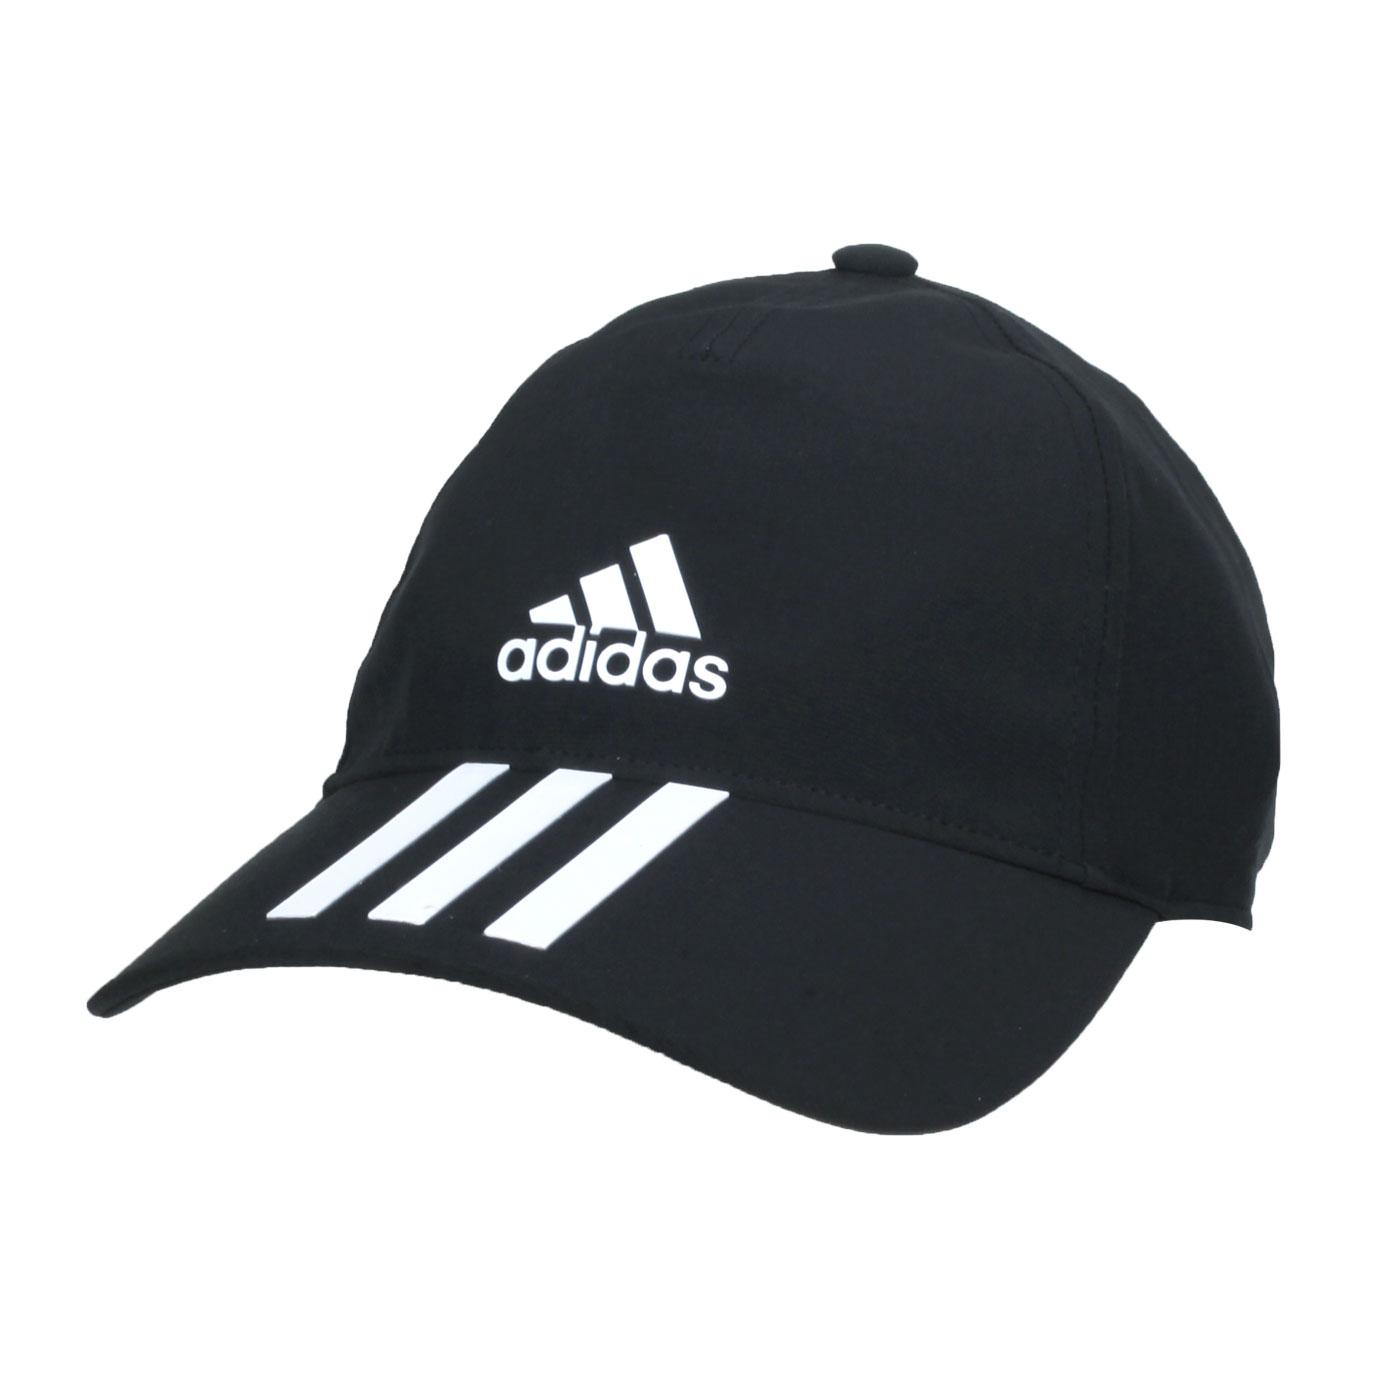 ADIDAS 帽子 GM6278 - 黑白